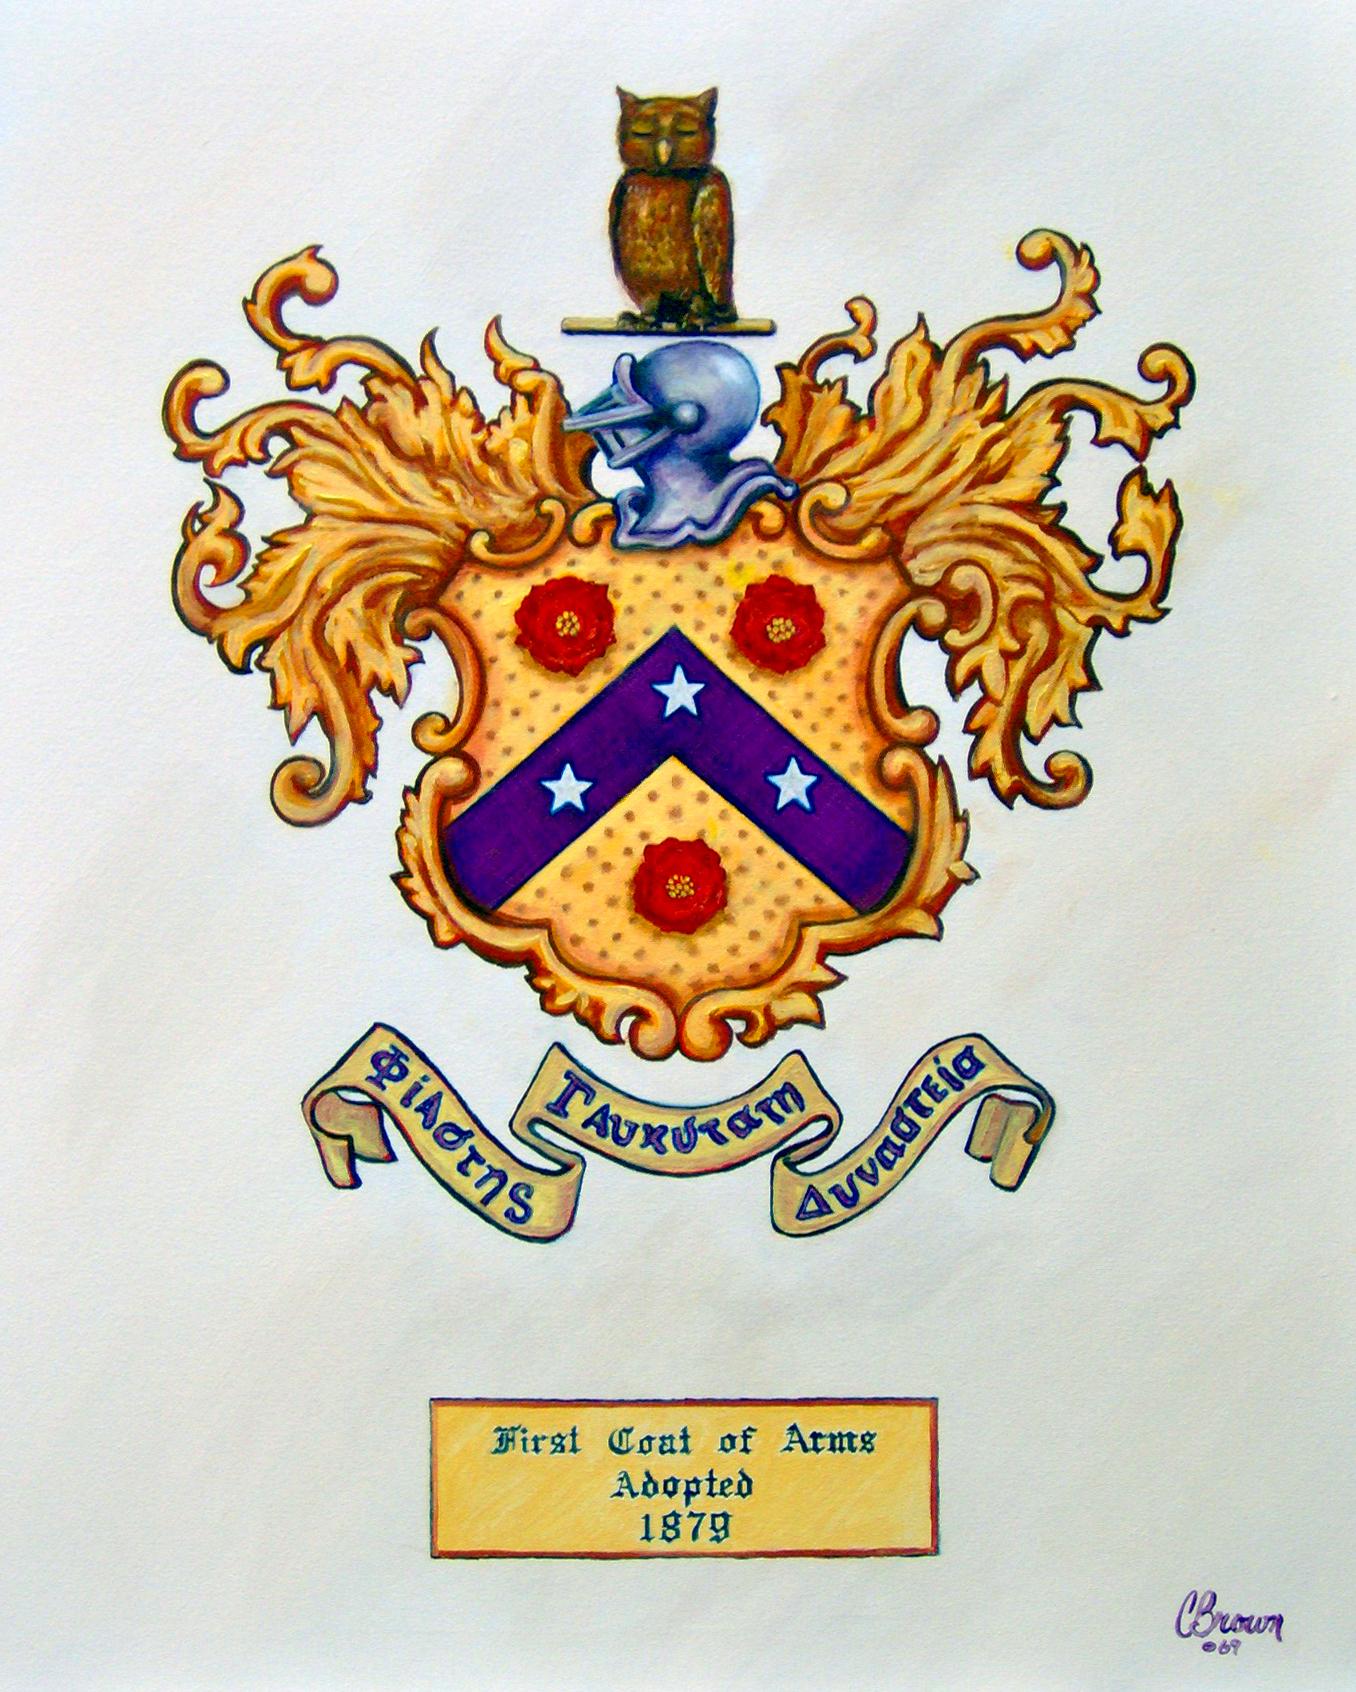 1879 Coat Of Arms Color Phi Gamma Delta Digital Repository